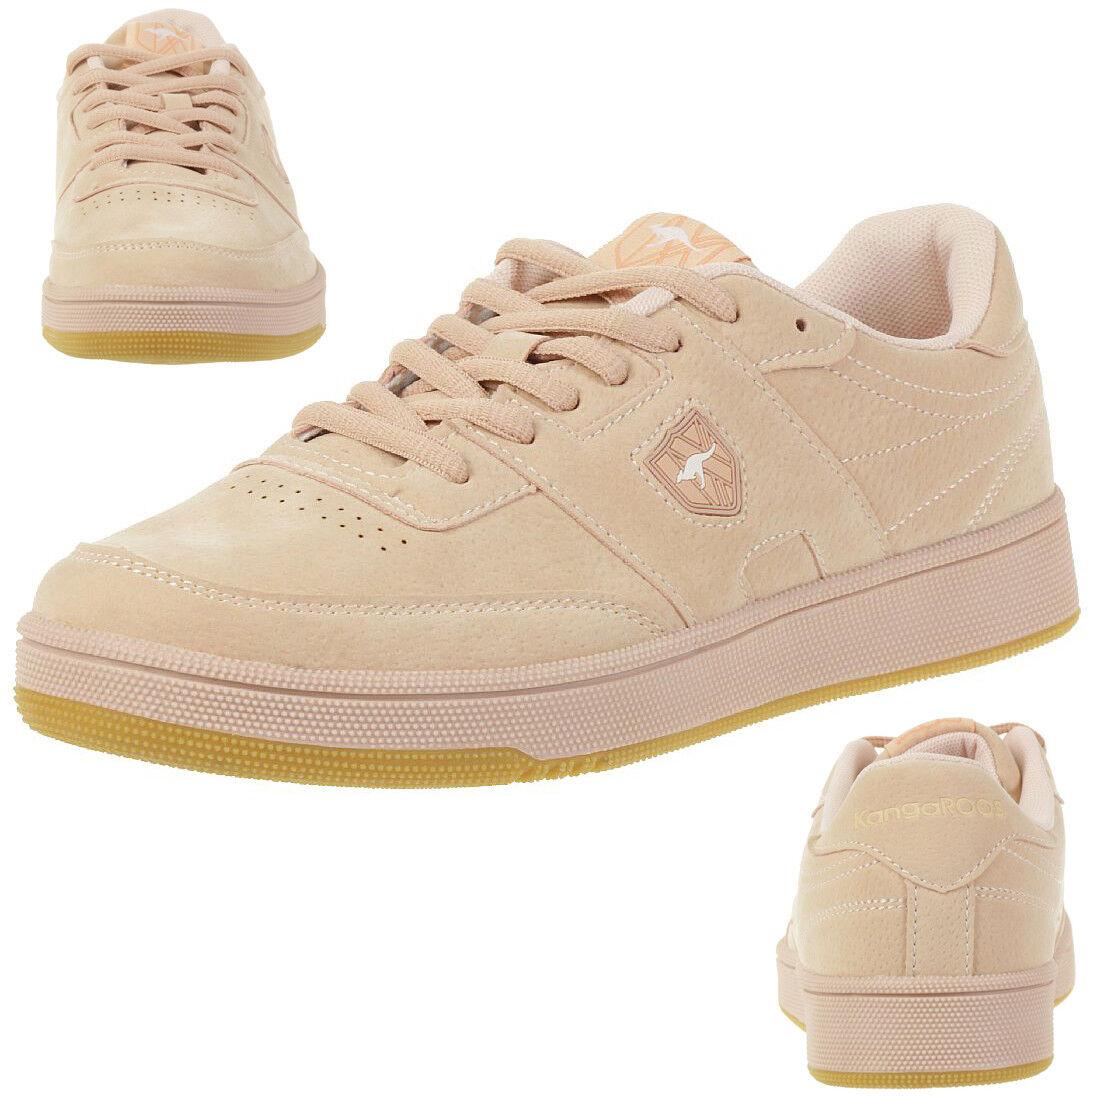 Kangaroos Retro Bonnet Baskets Chaussures Femmes 81048000 Rose